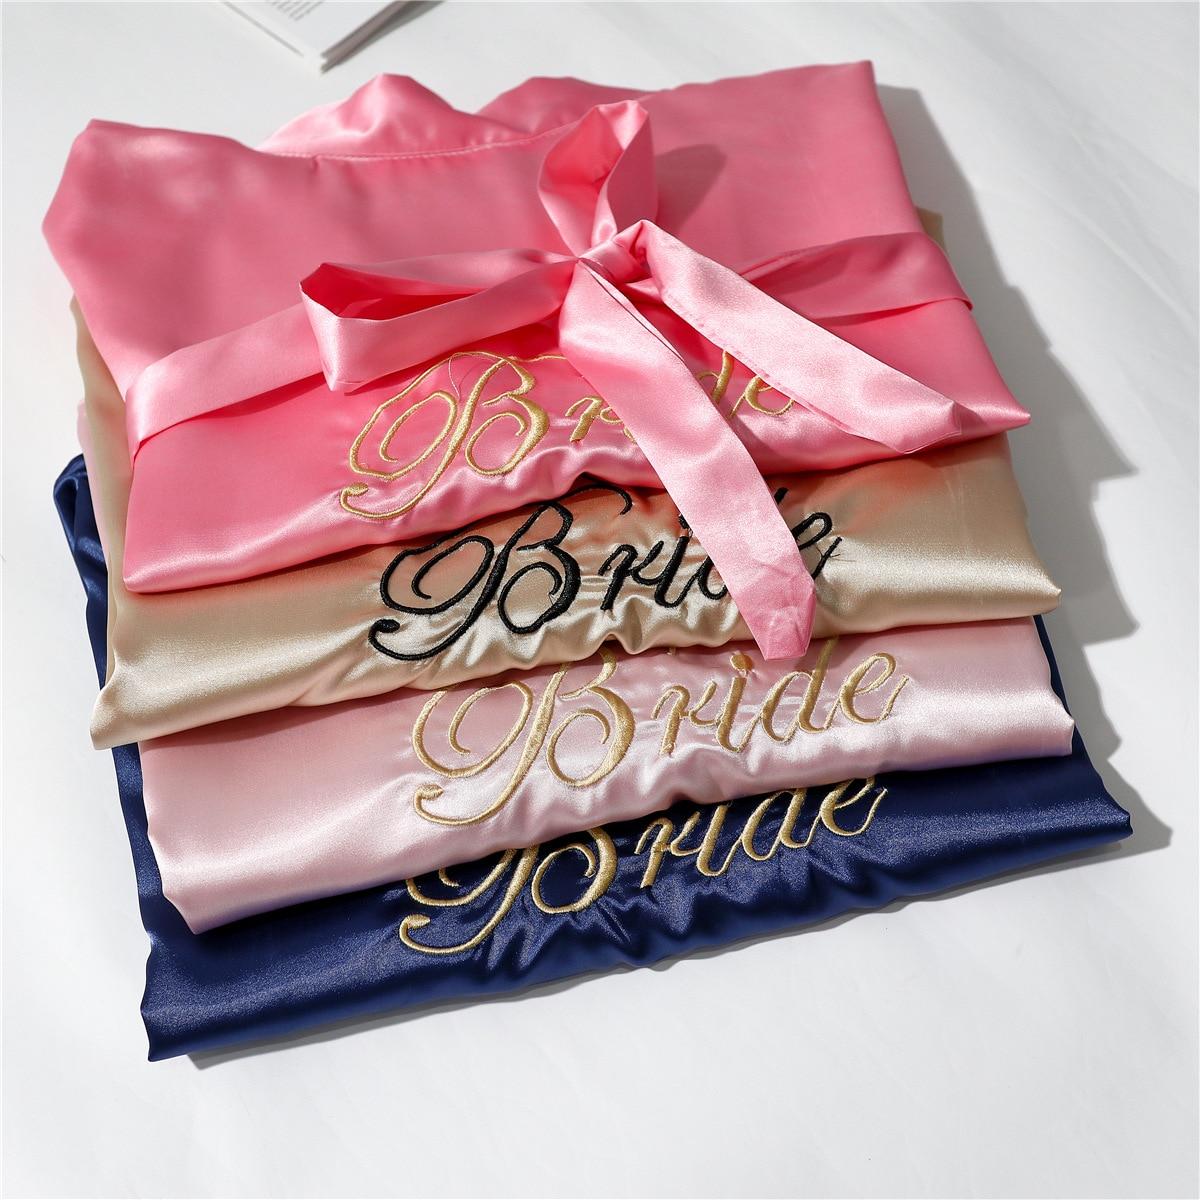 Bride Bridesmaid wedding Short Robe Bath Gown New Womens Summer Kimono Yukata Nightgown Lady Sleepshirts pajama